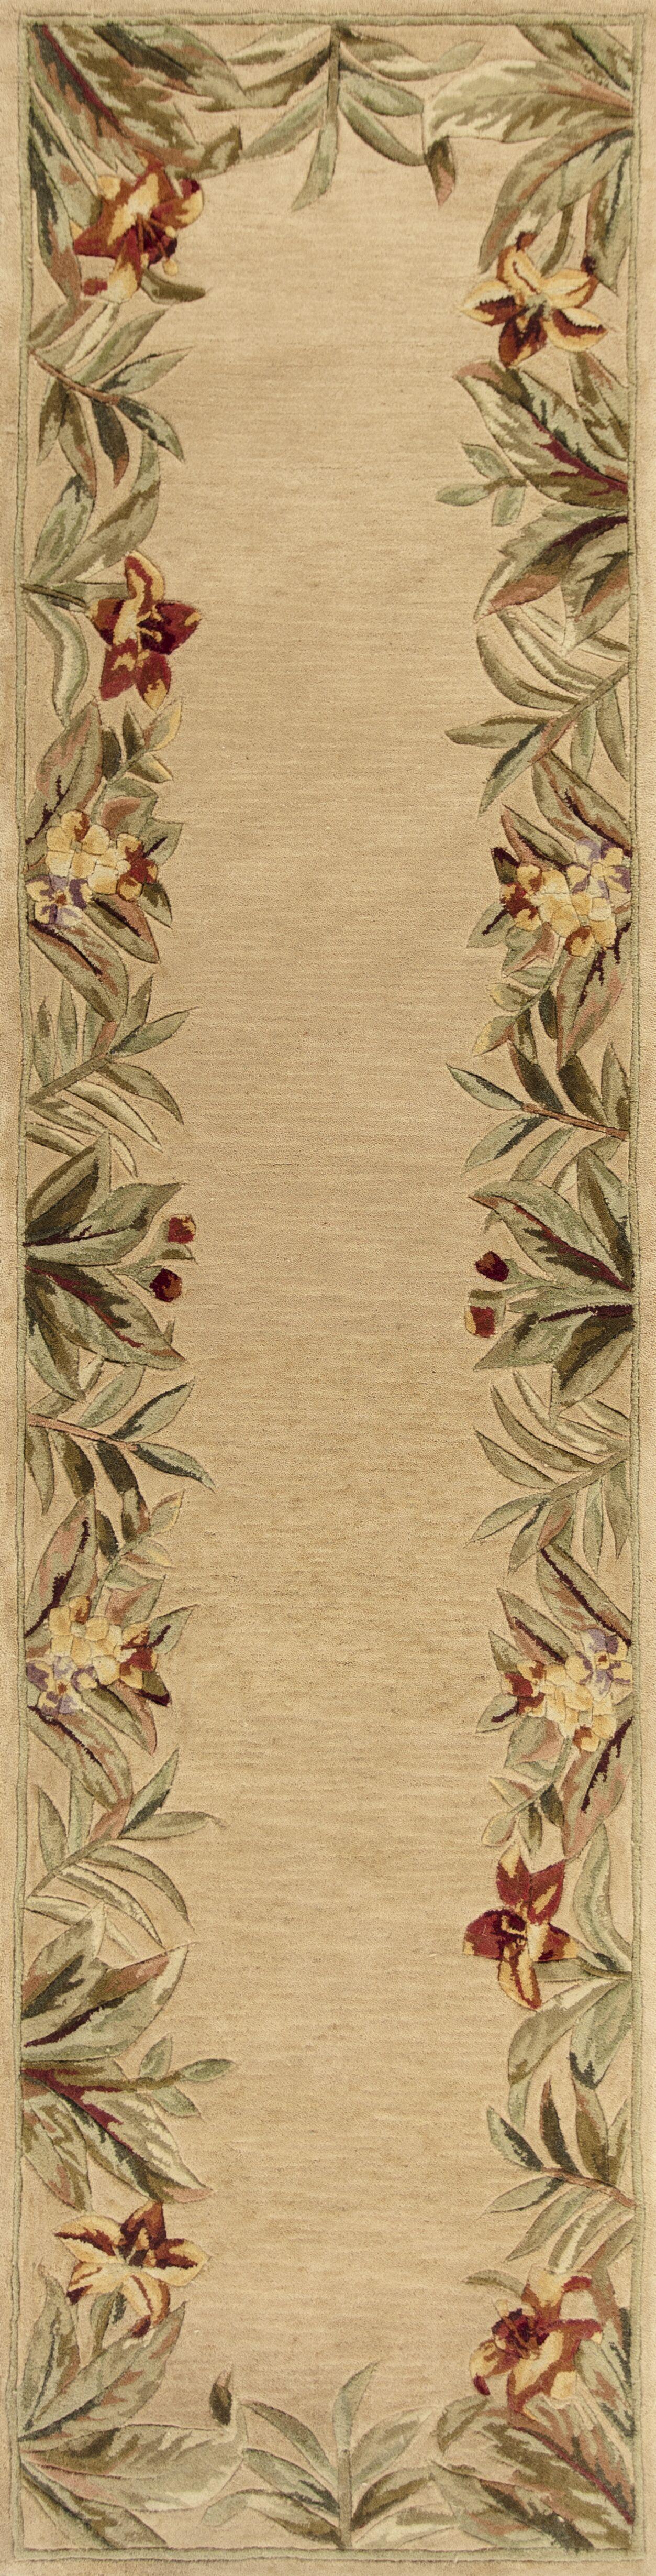 Murray Beige Rainforest Floral Area Rug Rug Size: Rectangle 8'6